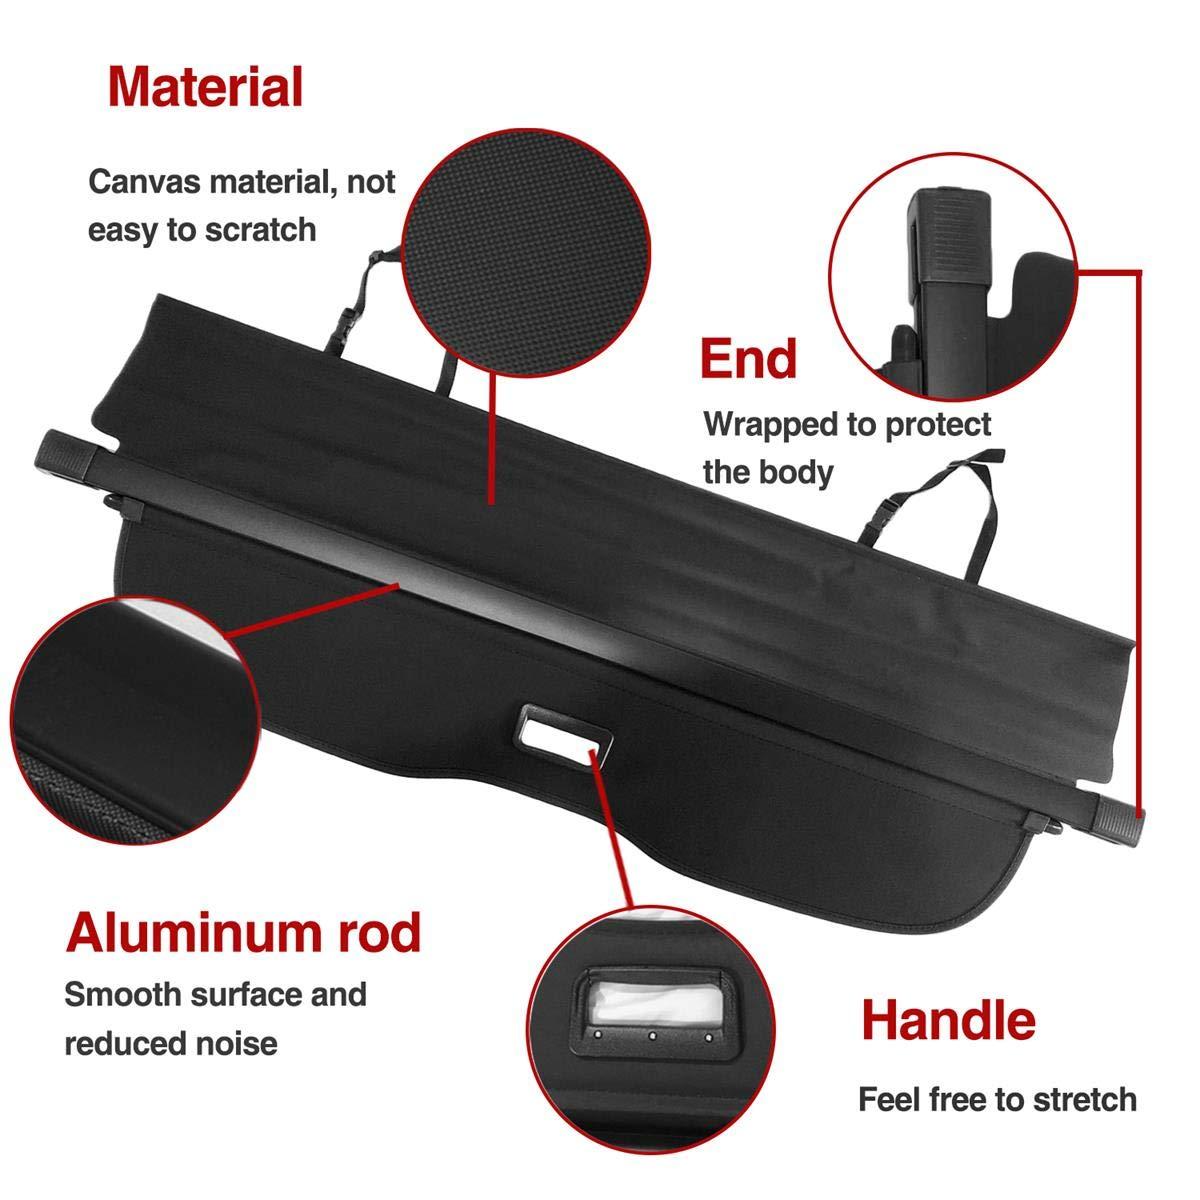 Autoxrun Rear Trunk Cover Retractable Black Cargo Cover Fits 2015-2017 Ford Edge